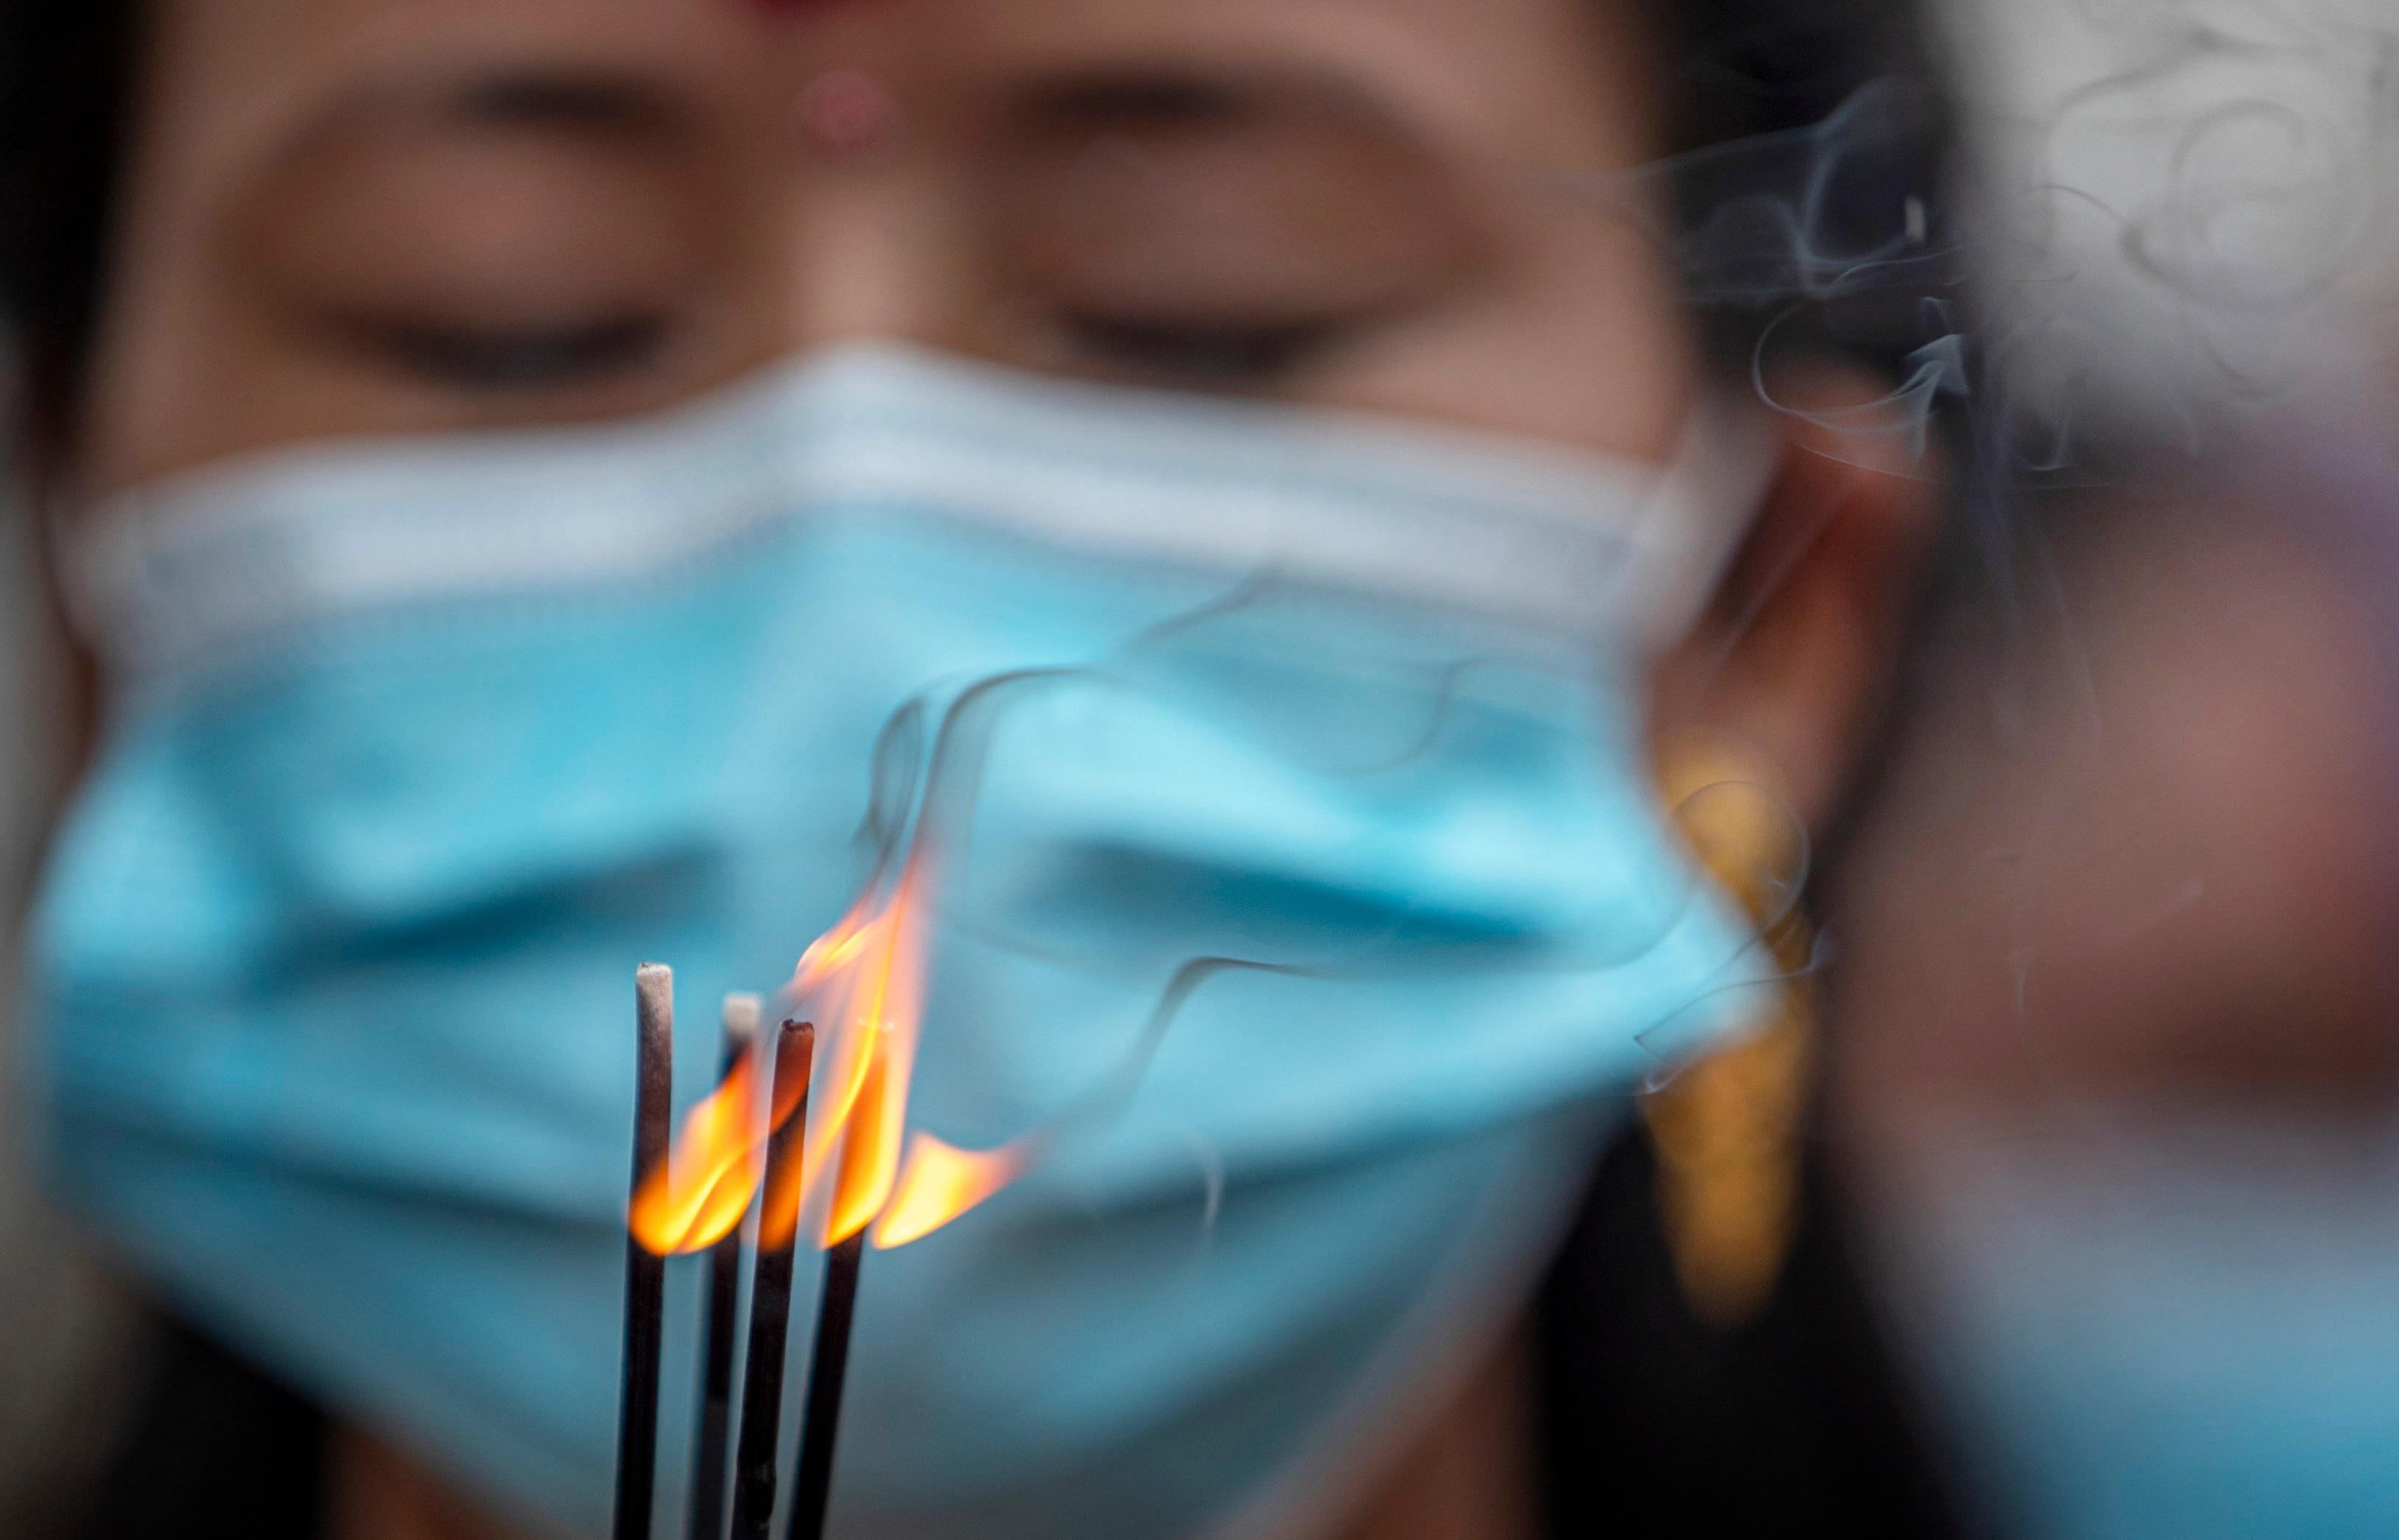 A woman wears a face mask as she worships Lord Shiva (Hindu god of creation and destruction) to mark the Teej festival amid the coronavirus pandemic fear in Kathmandu, Nepal, 09 September 2021.